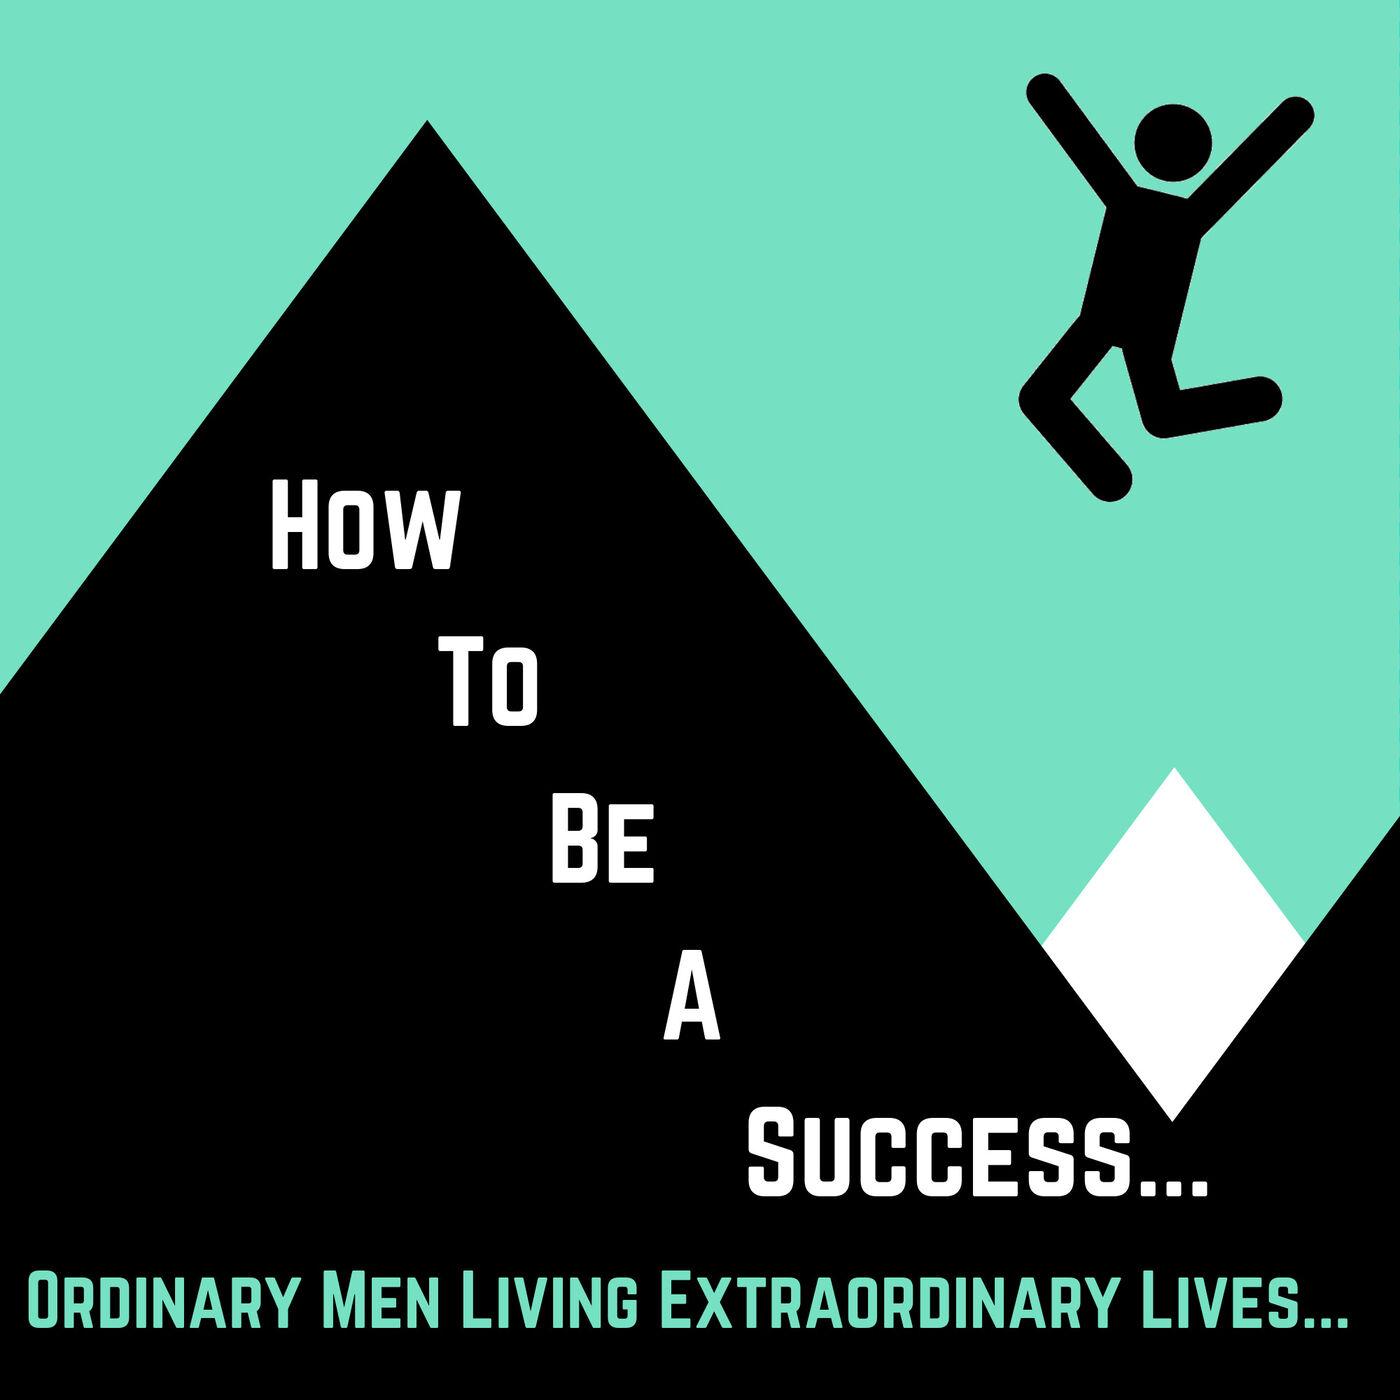 How To Be a Success: Ordinary Men Living Extraordinary Lives...